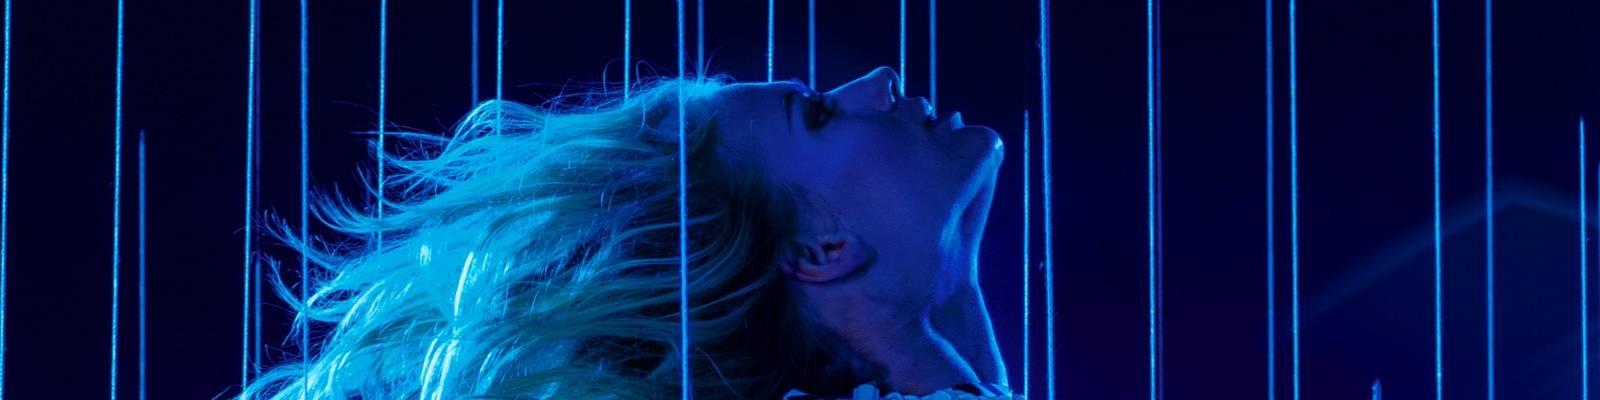 OUT NOW on ASOT: Armin van Buuren – I Live For That Energy (ASOT 800 Anthem)